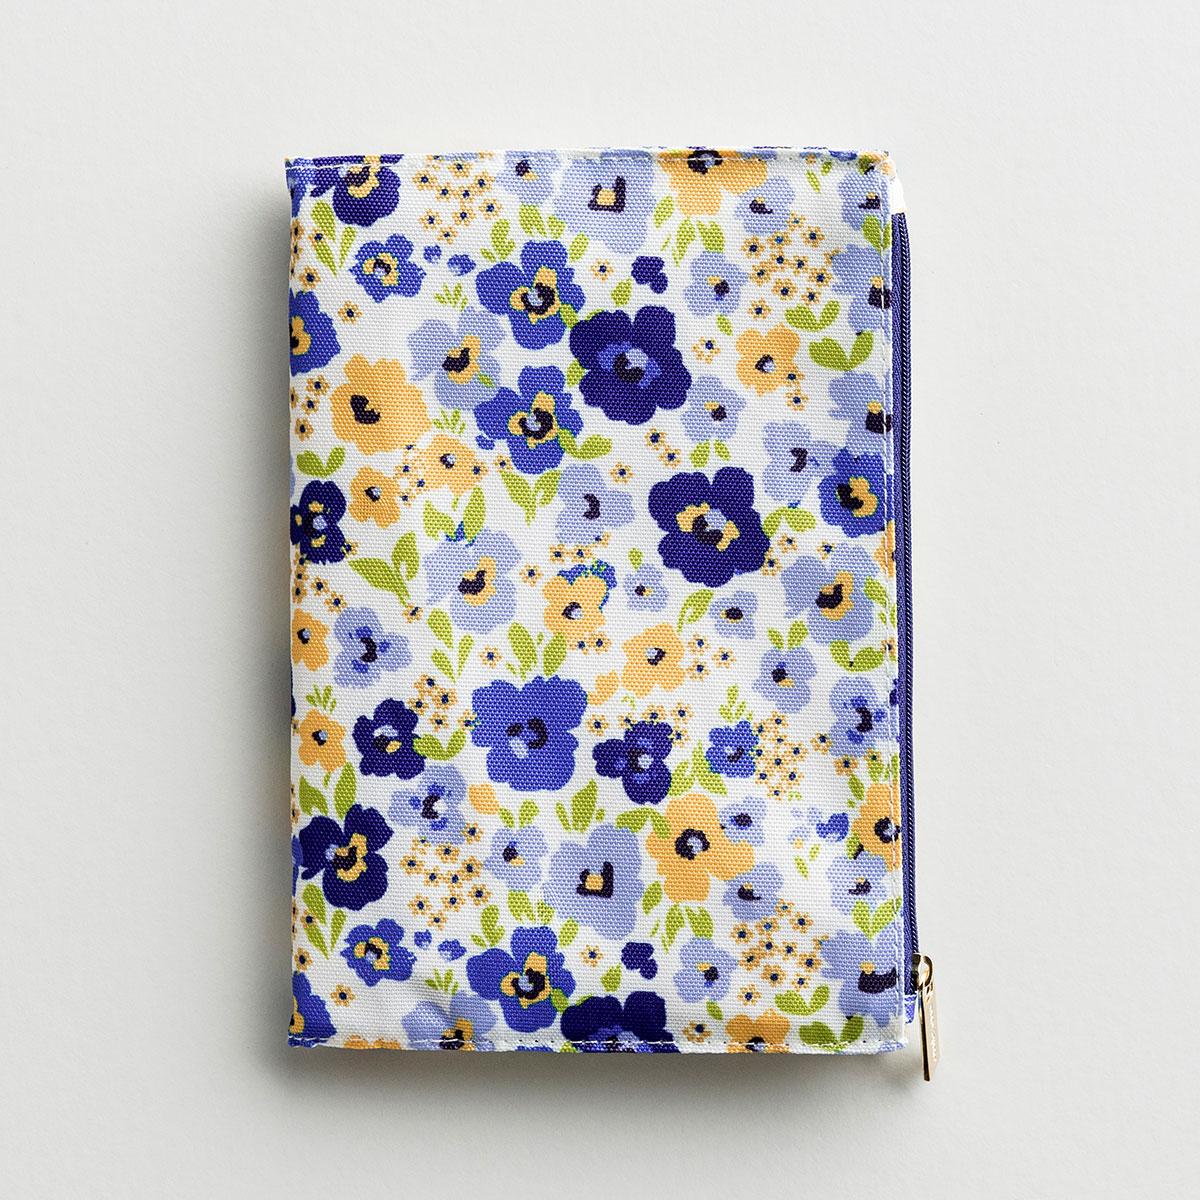 Floral Zip Pouch Journal - Birmingham